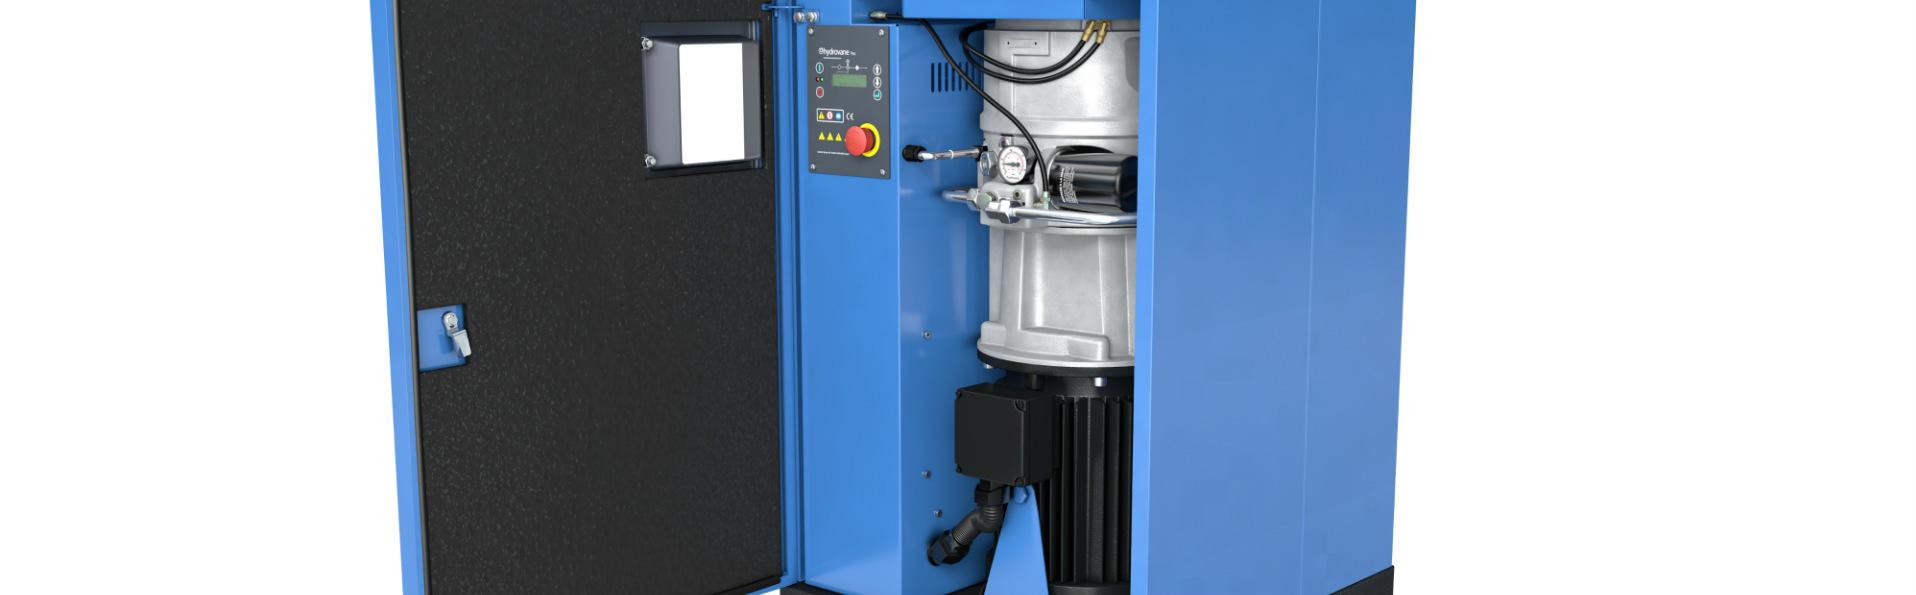 Hydrovane HR compressor